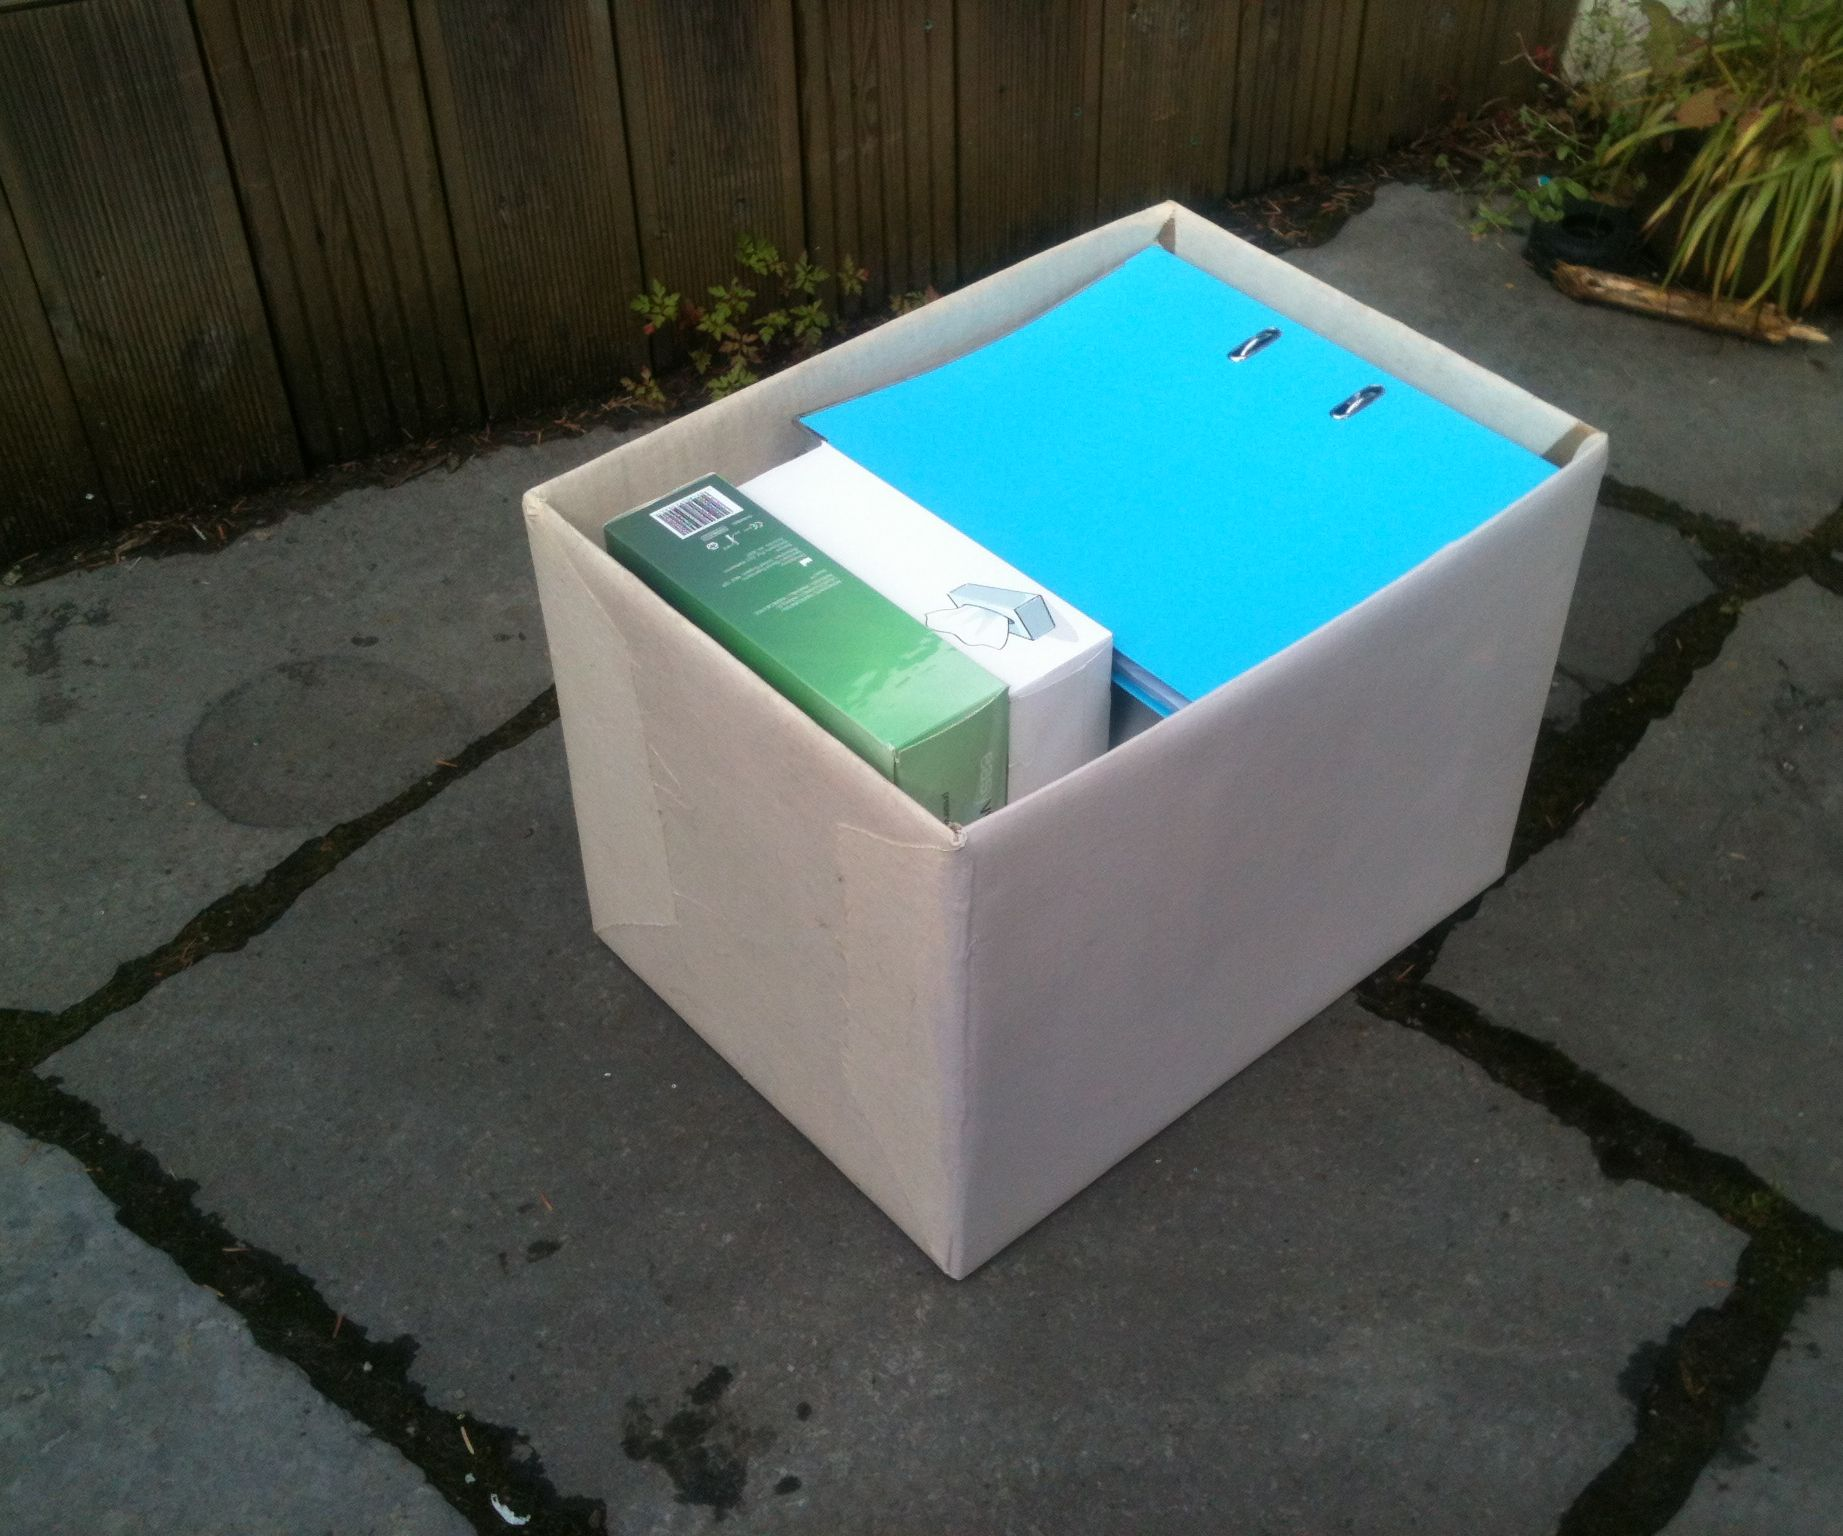 Canvas re-inforced cardboard storage box